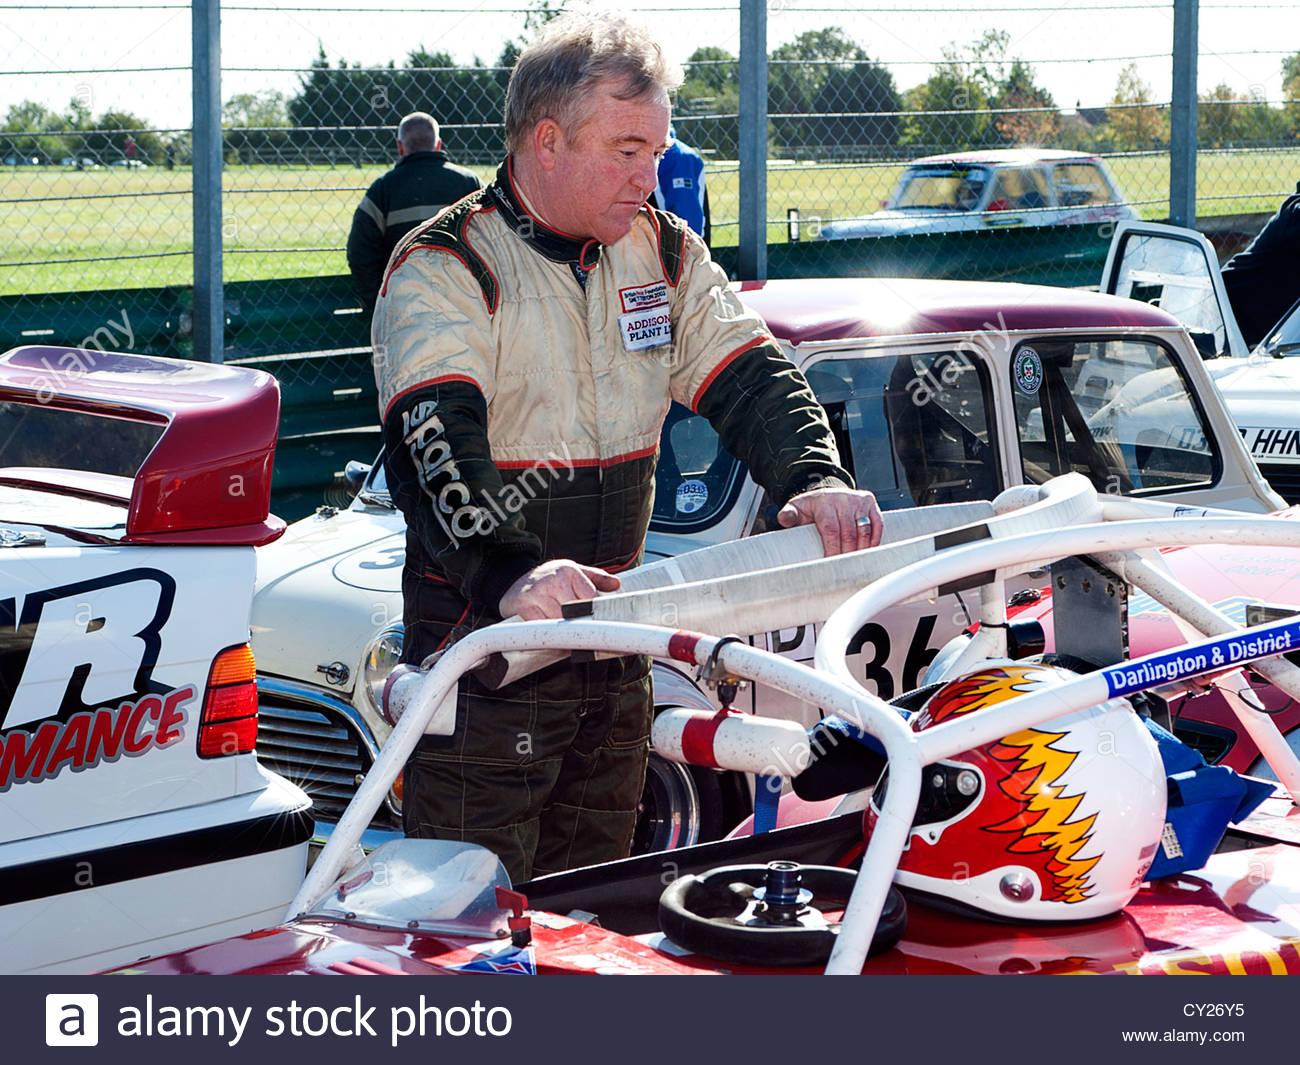 Bill Addison, North East Saloon Car Championship winner at Croft Circuit Darlington in 2012,stood next to his Caterham - Stock Image